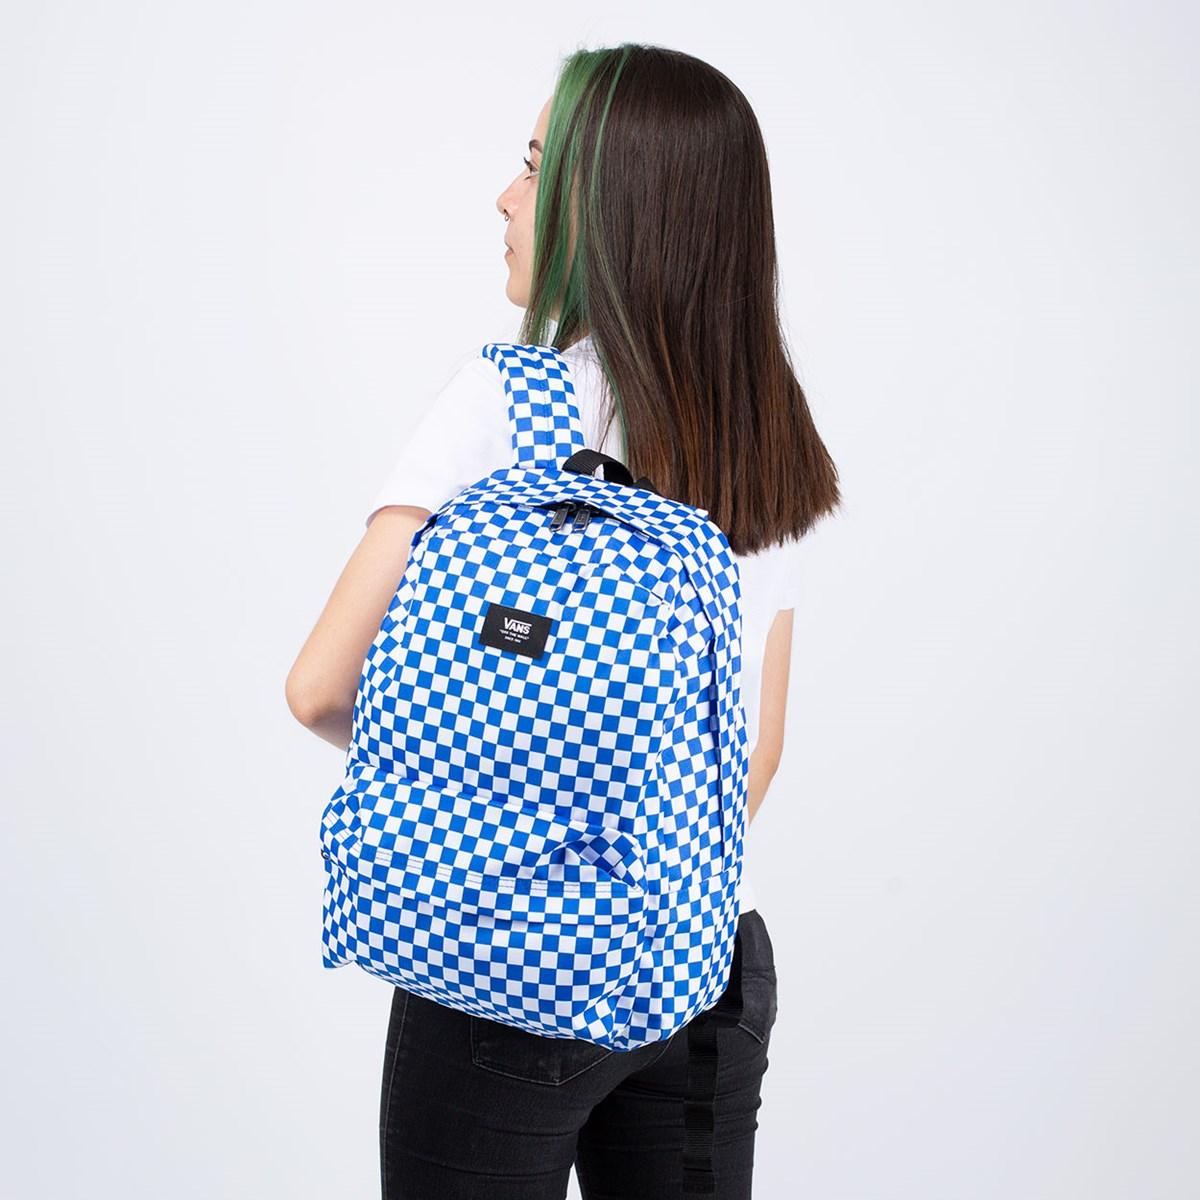 Mochila Vans Old Skool III Backpack Victoria Blue Checkerboard VN0A3I6RZZ4